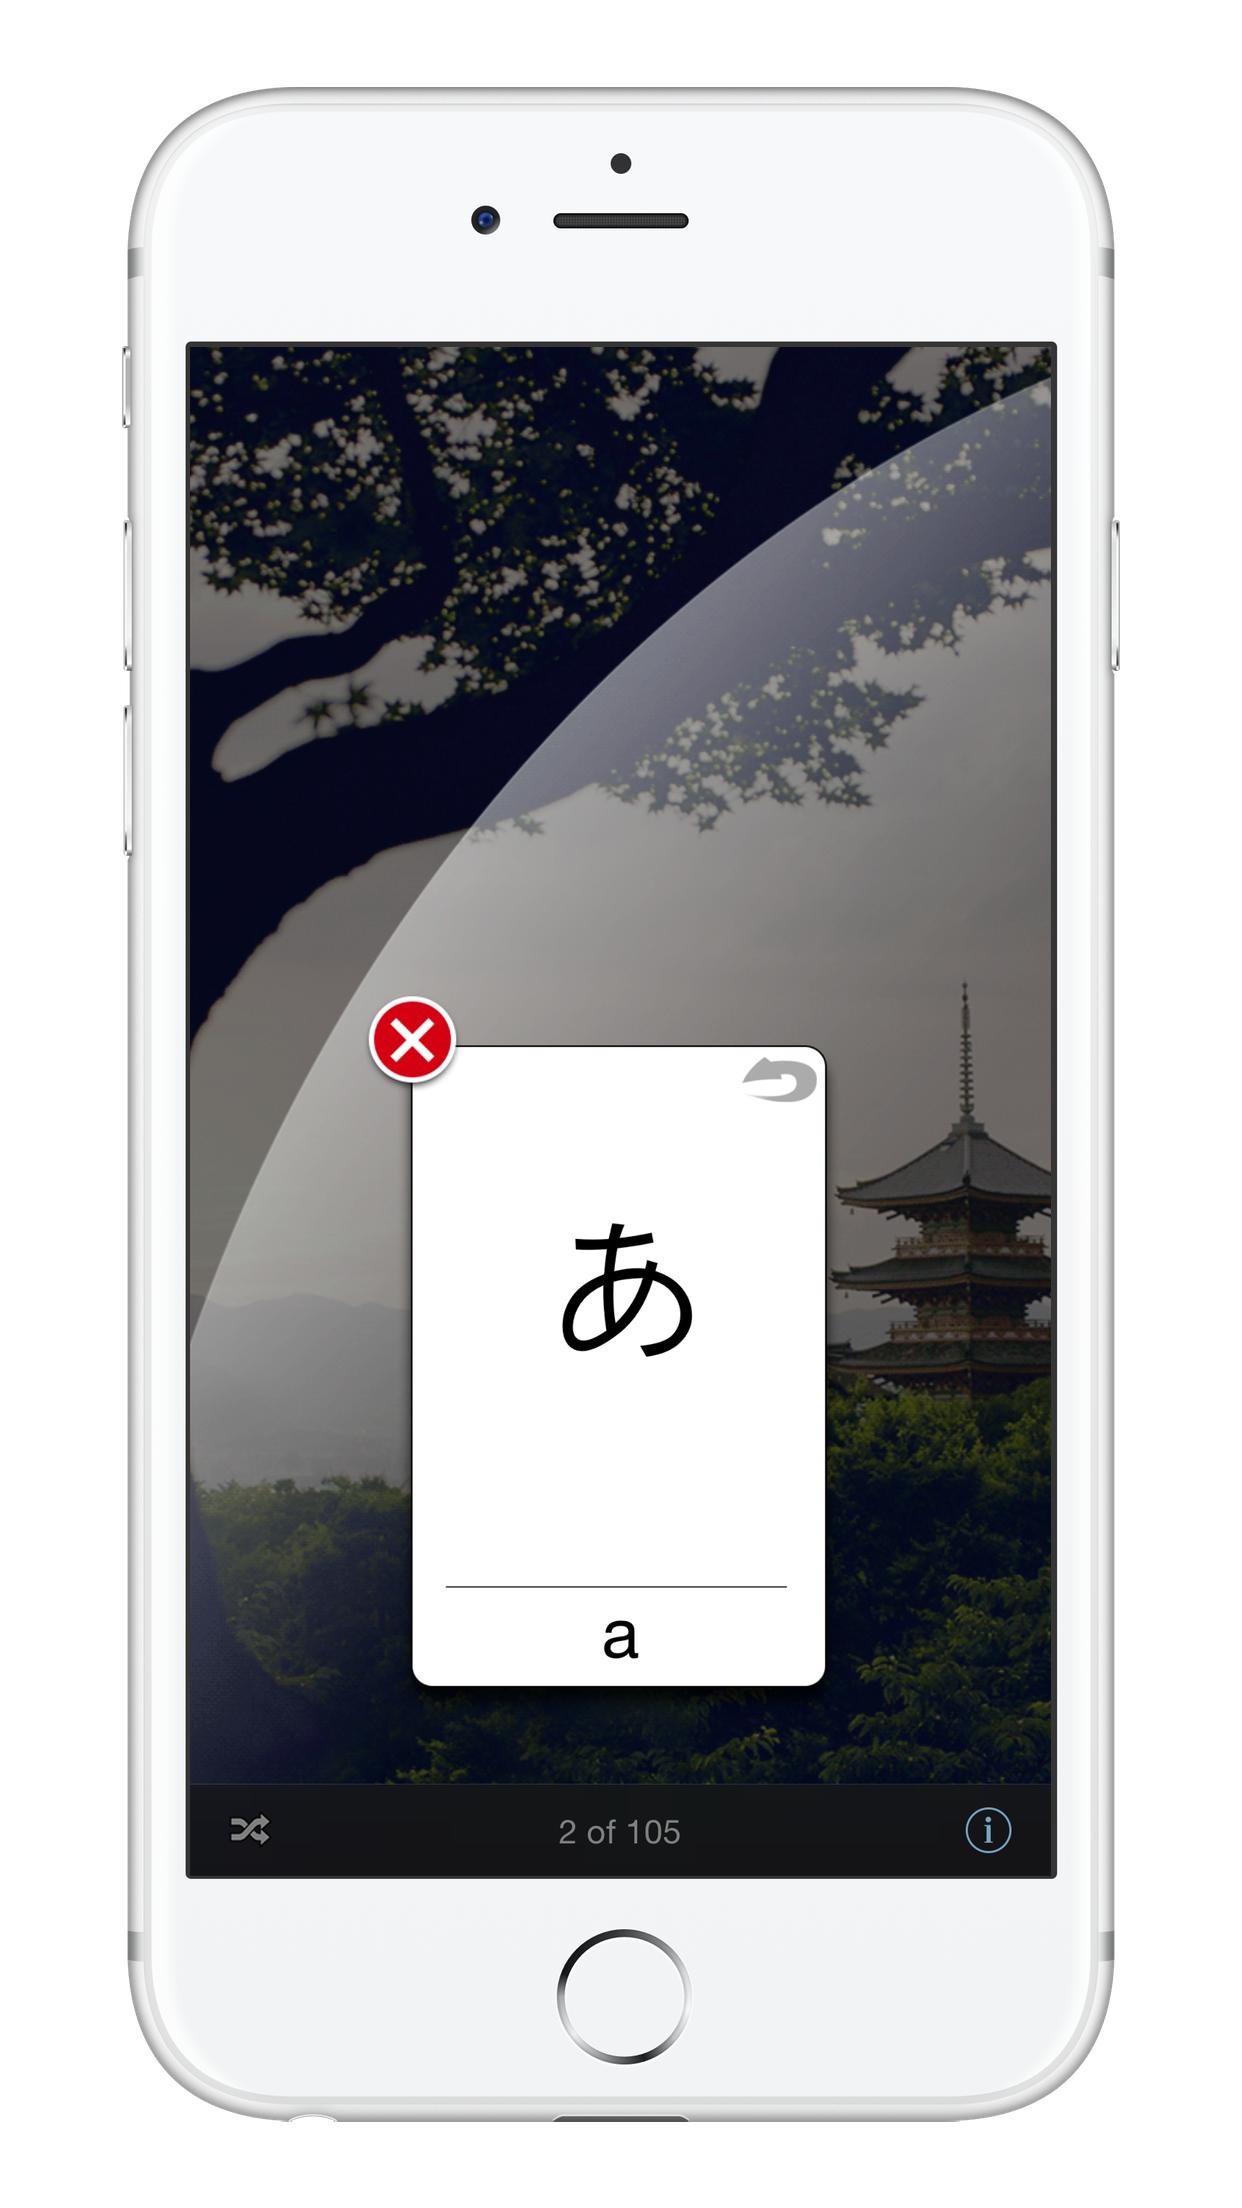 Hiragana screenshot 3.png